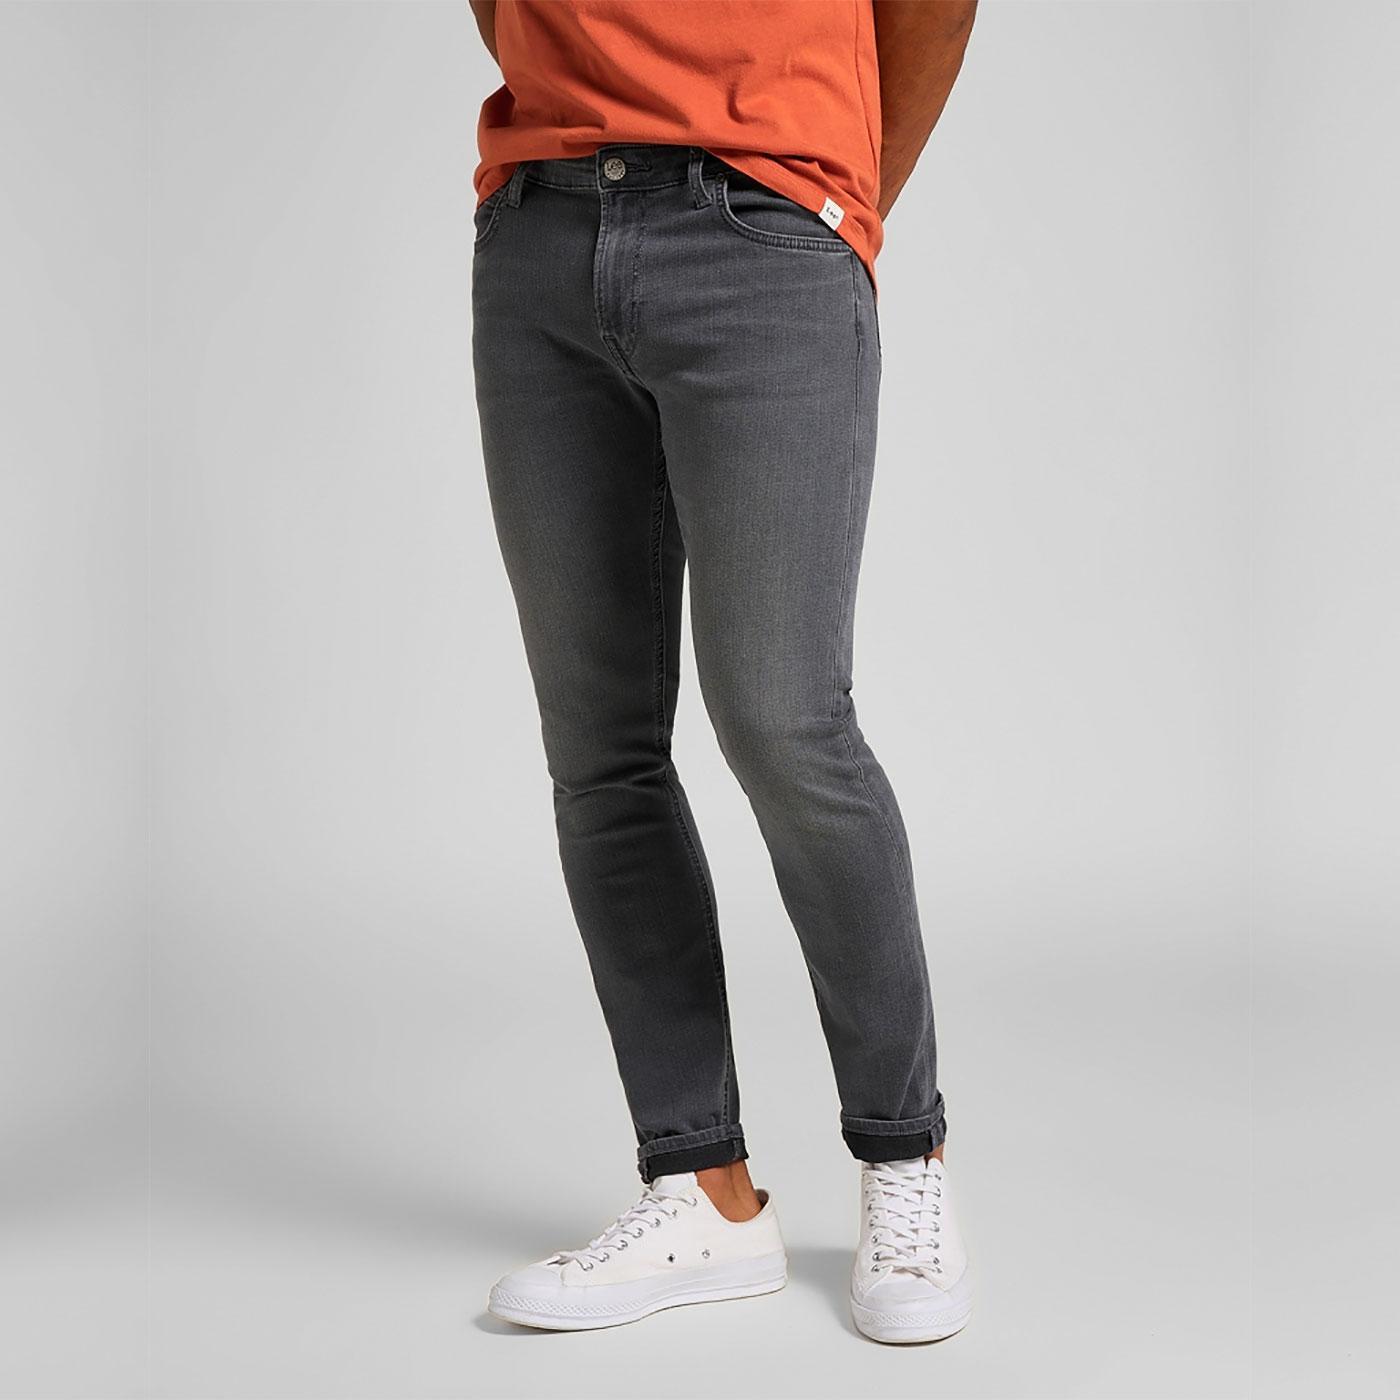 Malone LEE Men's Retro Skinny Jeans (Mid Eden)